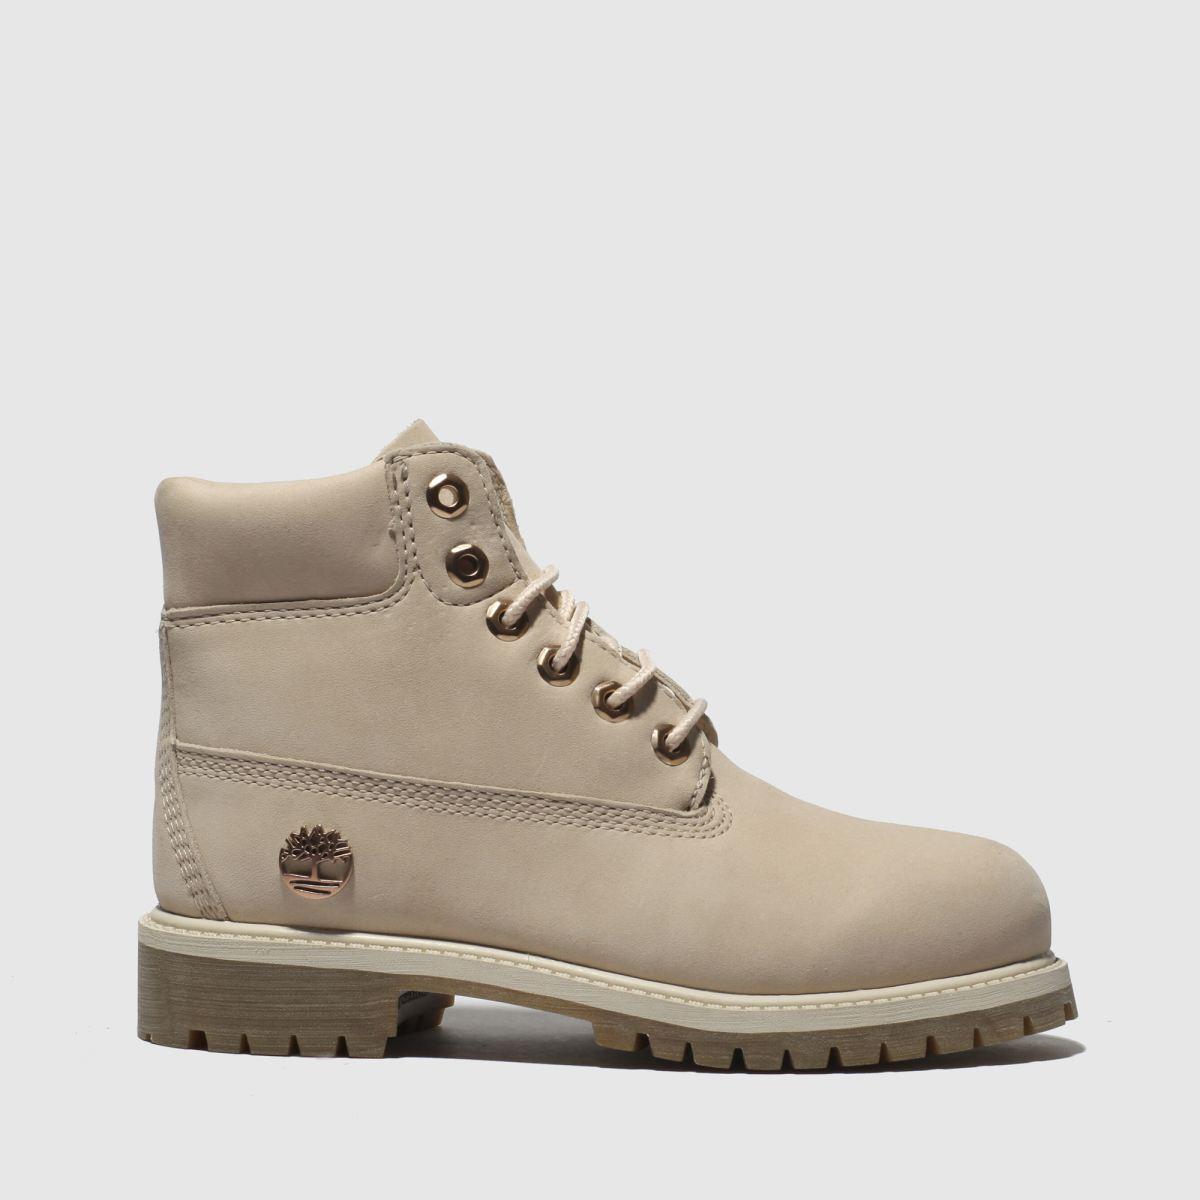 Timberland Pale Pink 6 Inch Premium Boots Junior